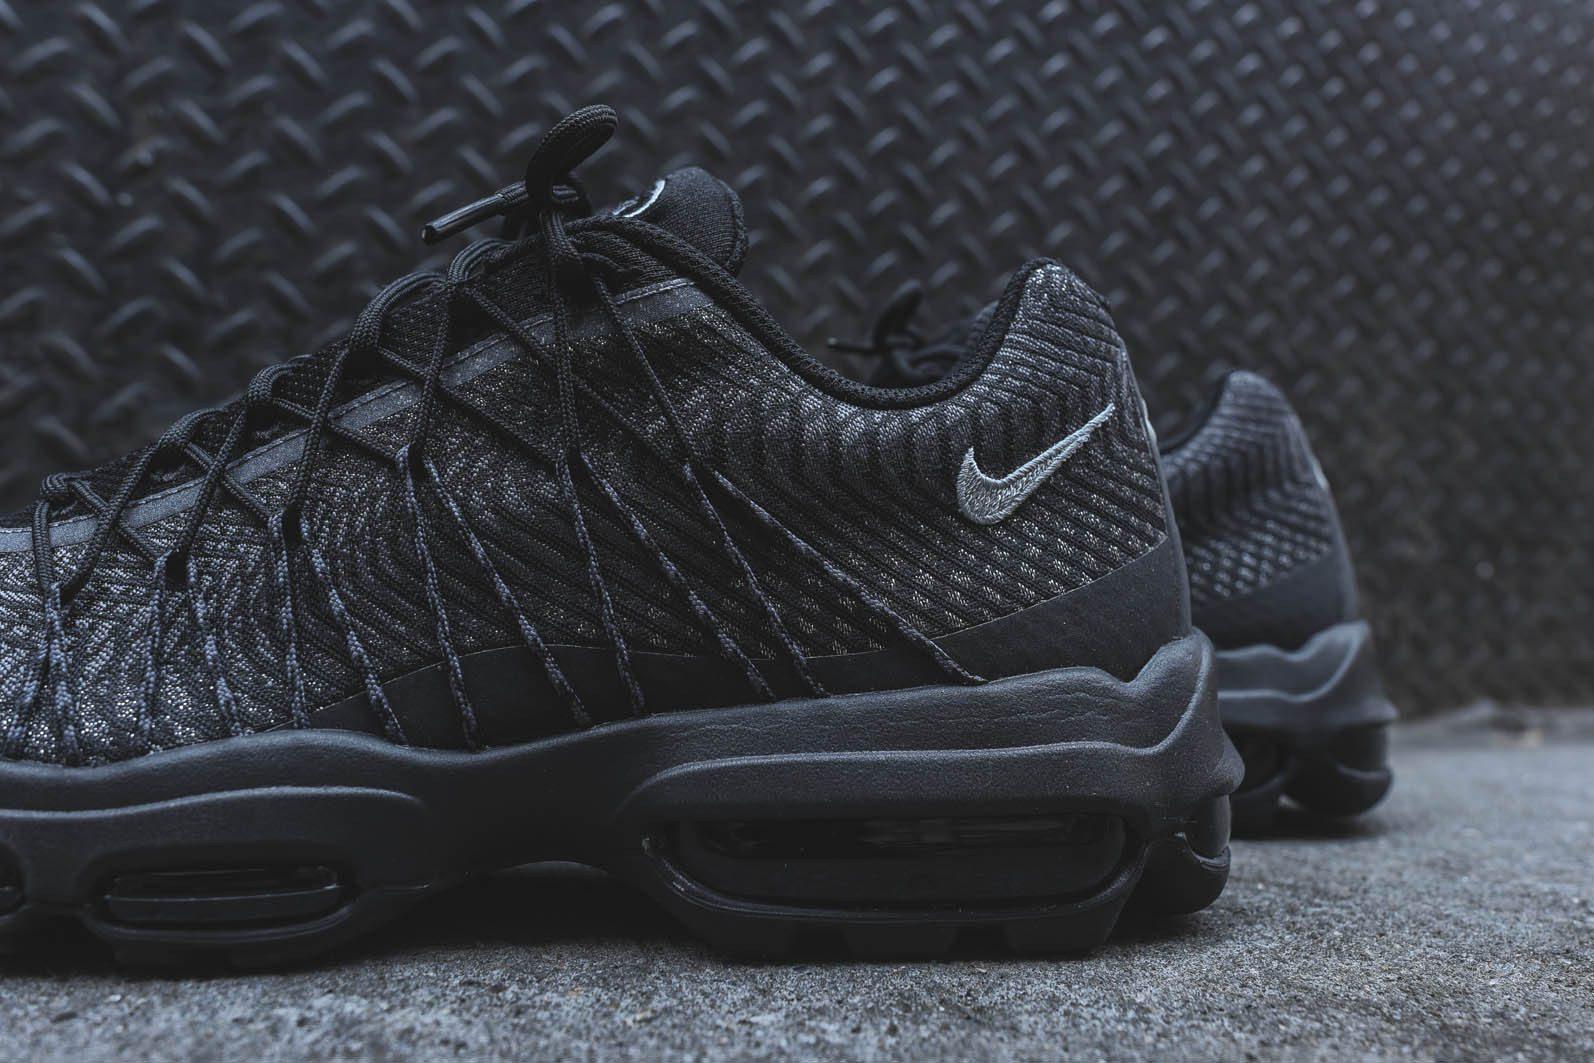 ? Nike Air Max 95 Ultra JCRD - Black Dark Grey | #SNKR?